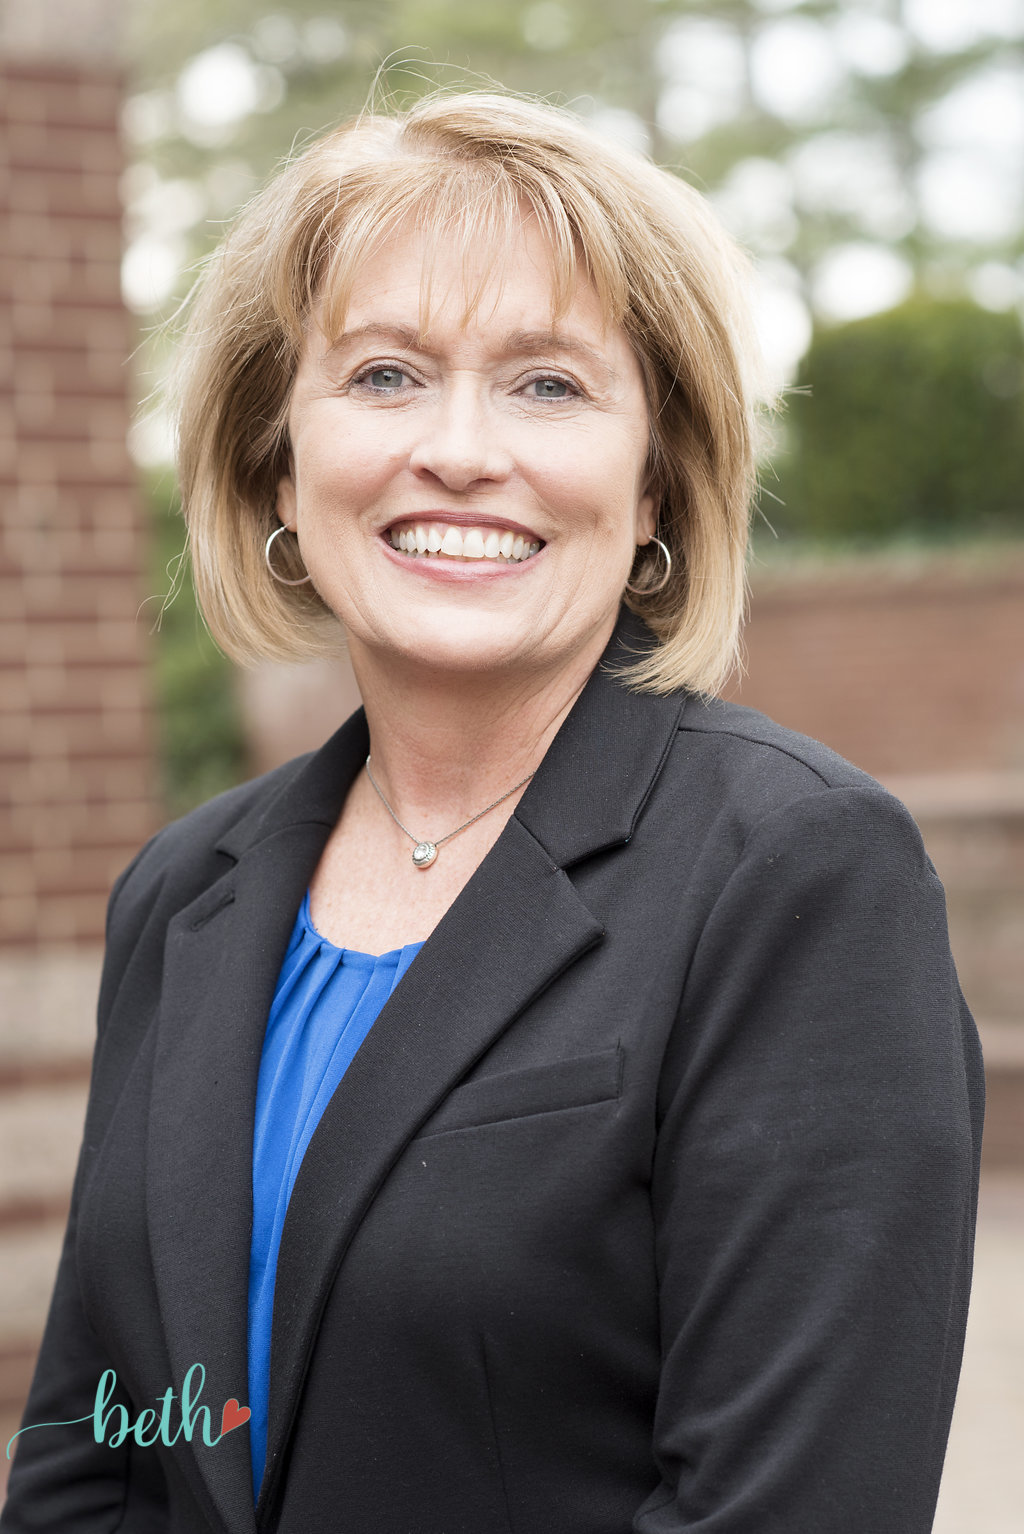 Ruth Ann Suttle, Custom Benefits Solutions' Lead Enrollment Specialist